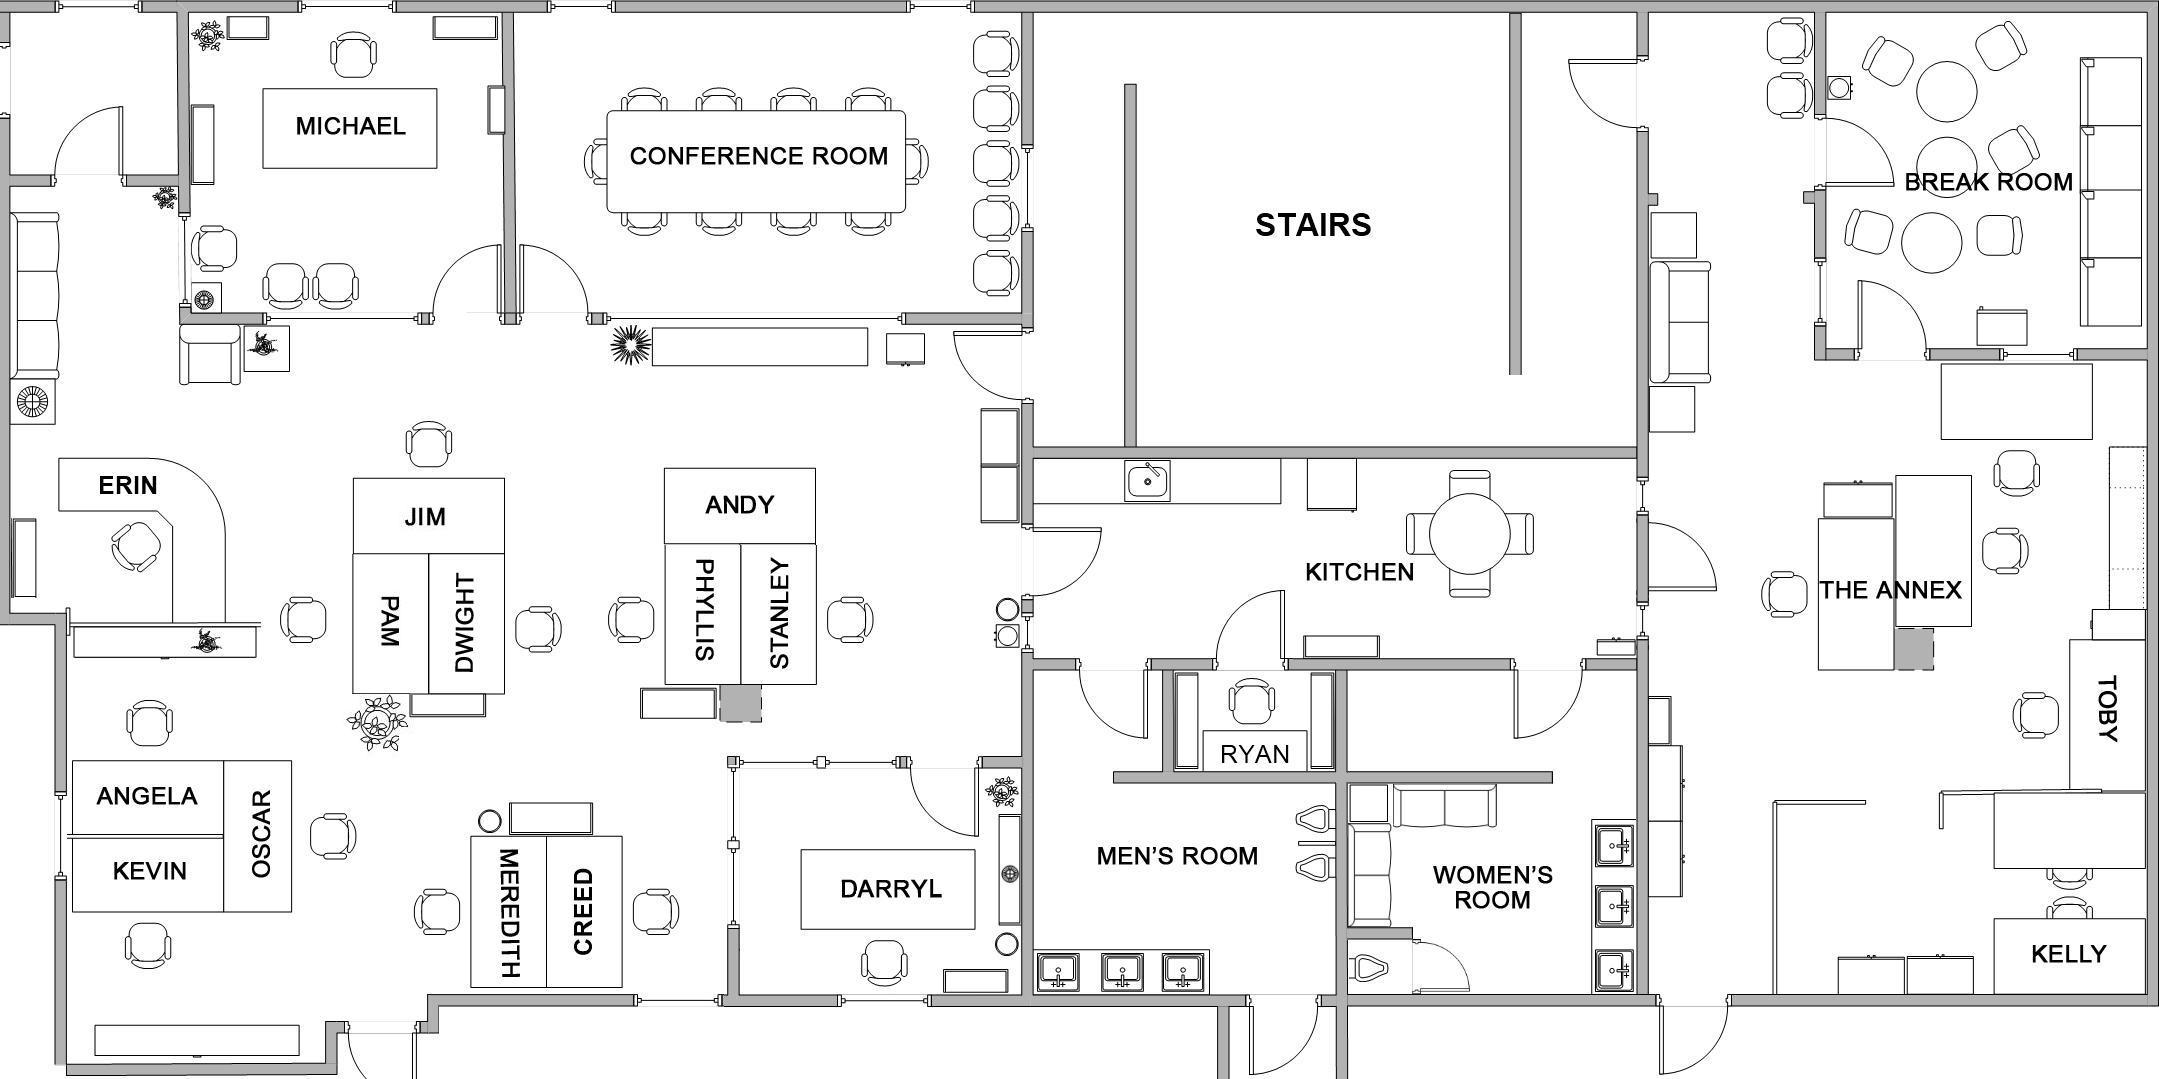 Charming ... Office Blueprint ...